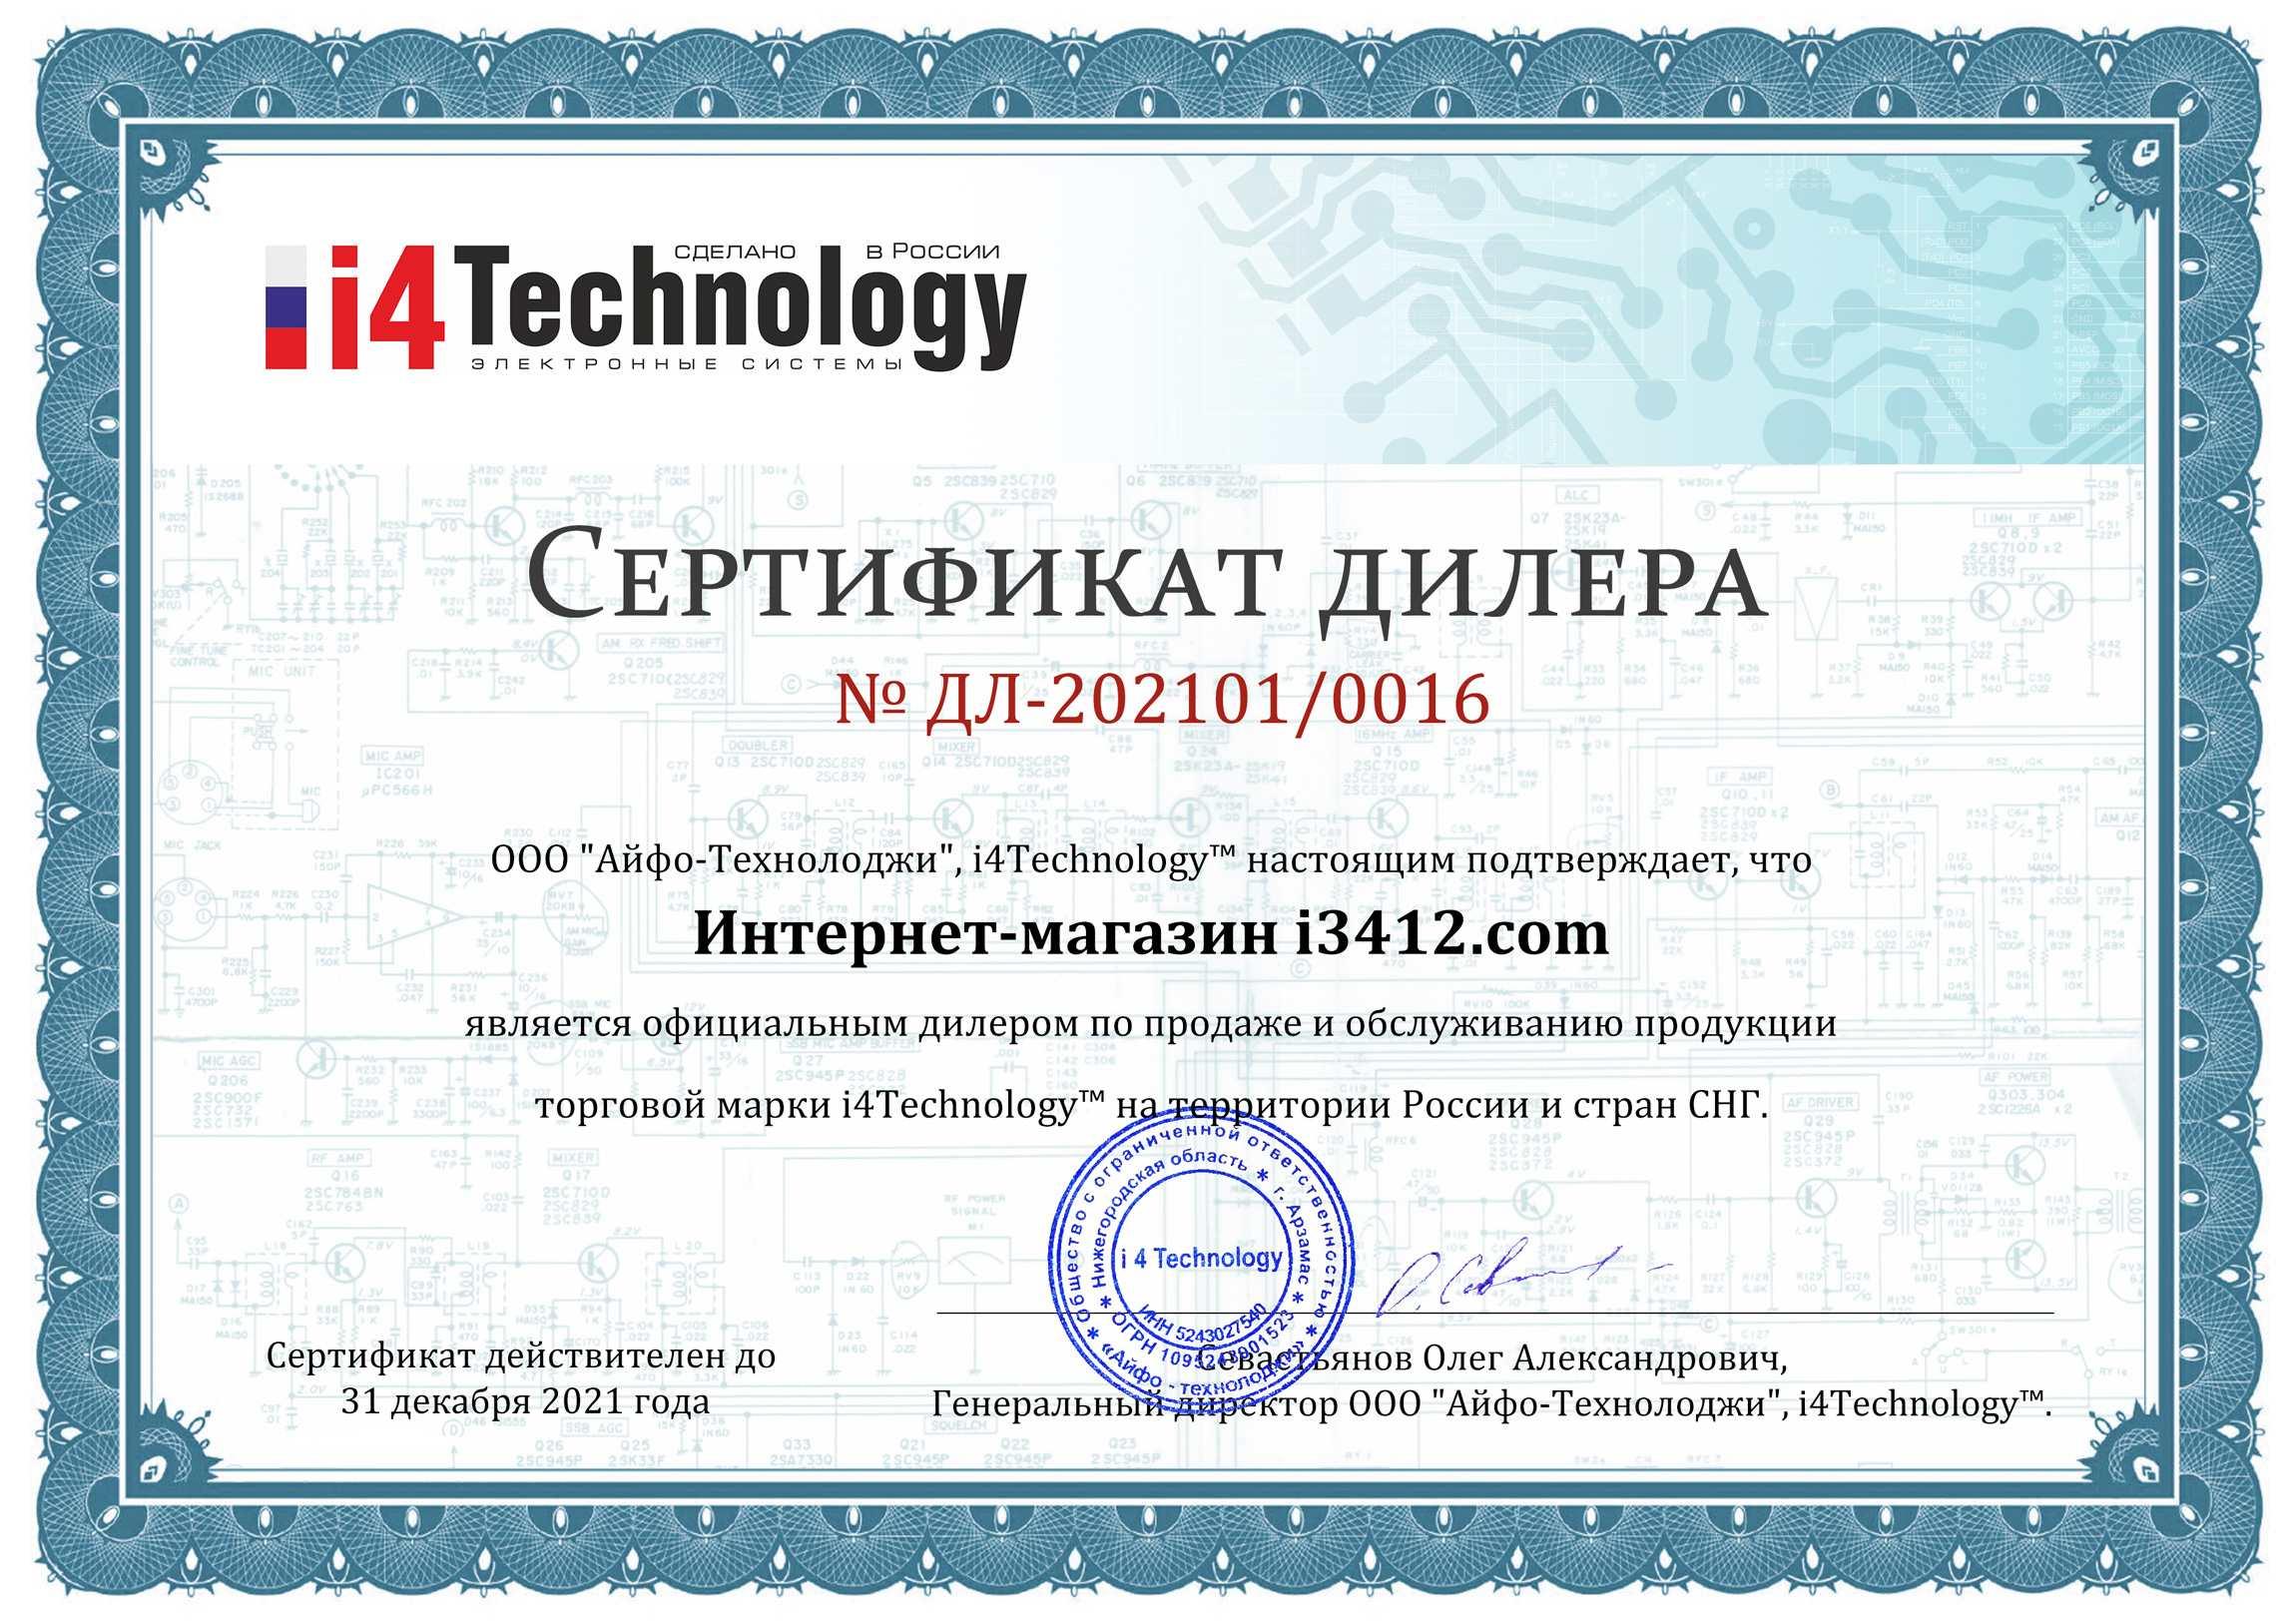 "Сертификат дилера на право реализации и обслуживания продукции ТМ ""i4technology"", на территории России и государств СНГ"